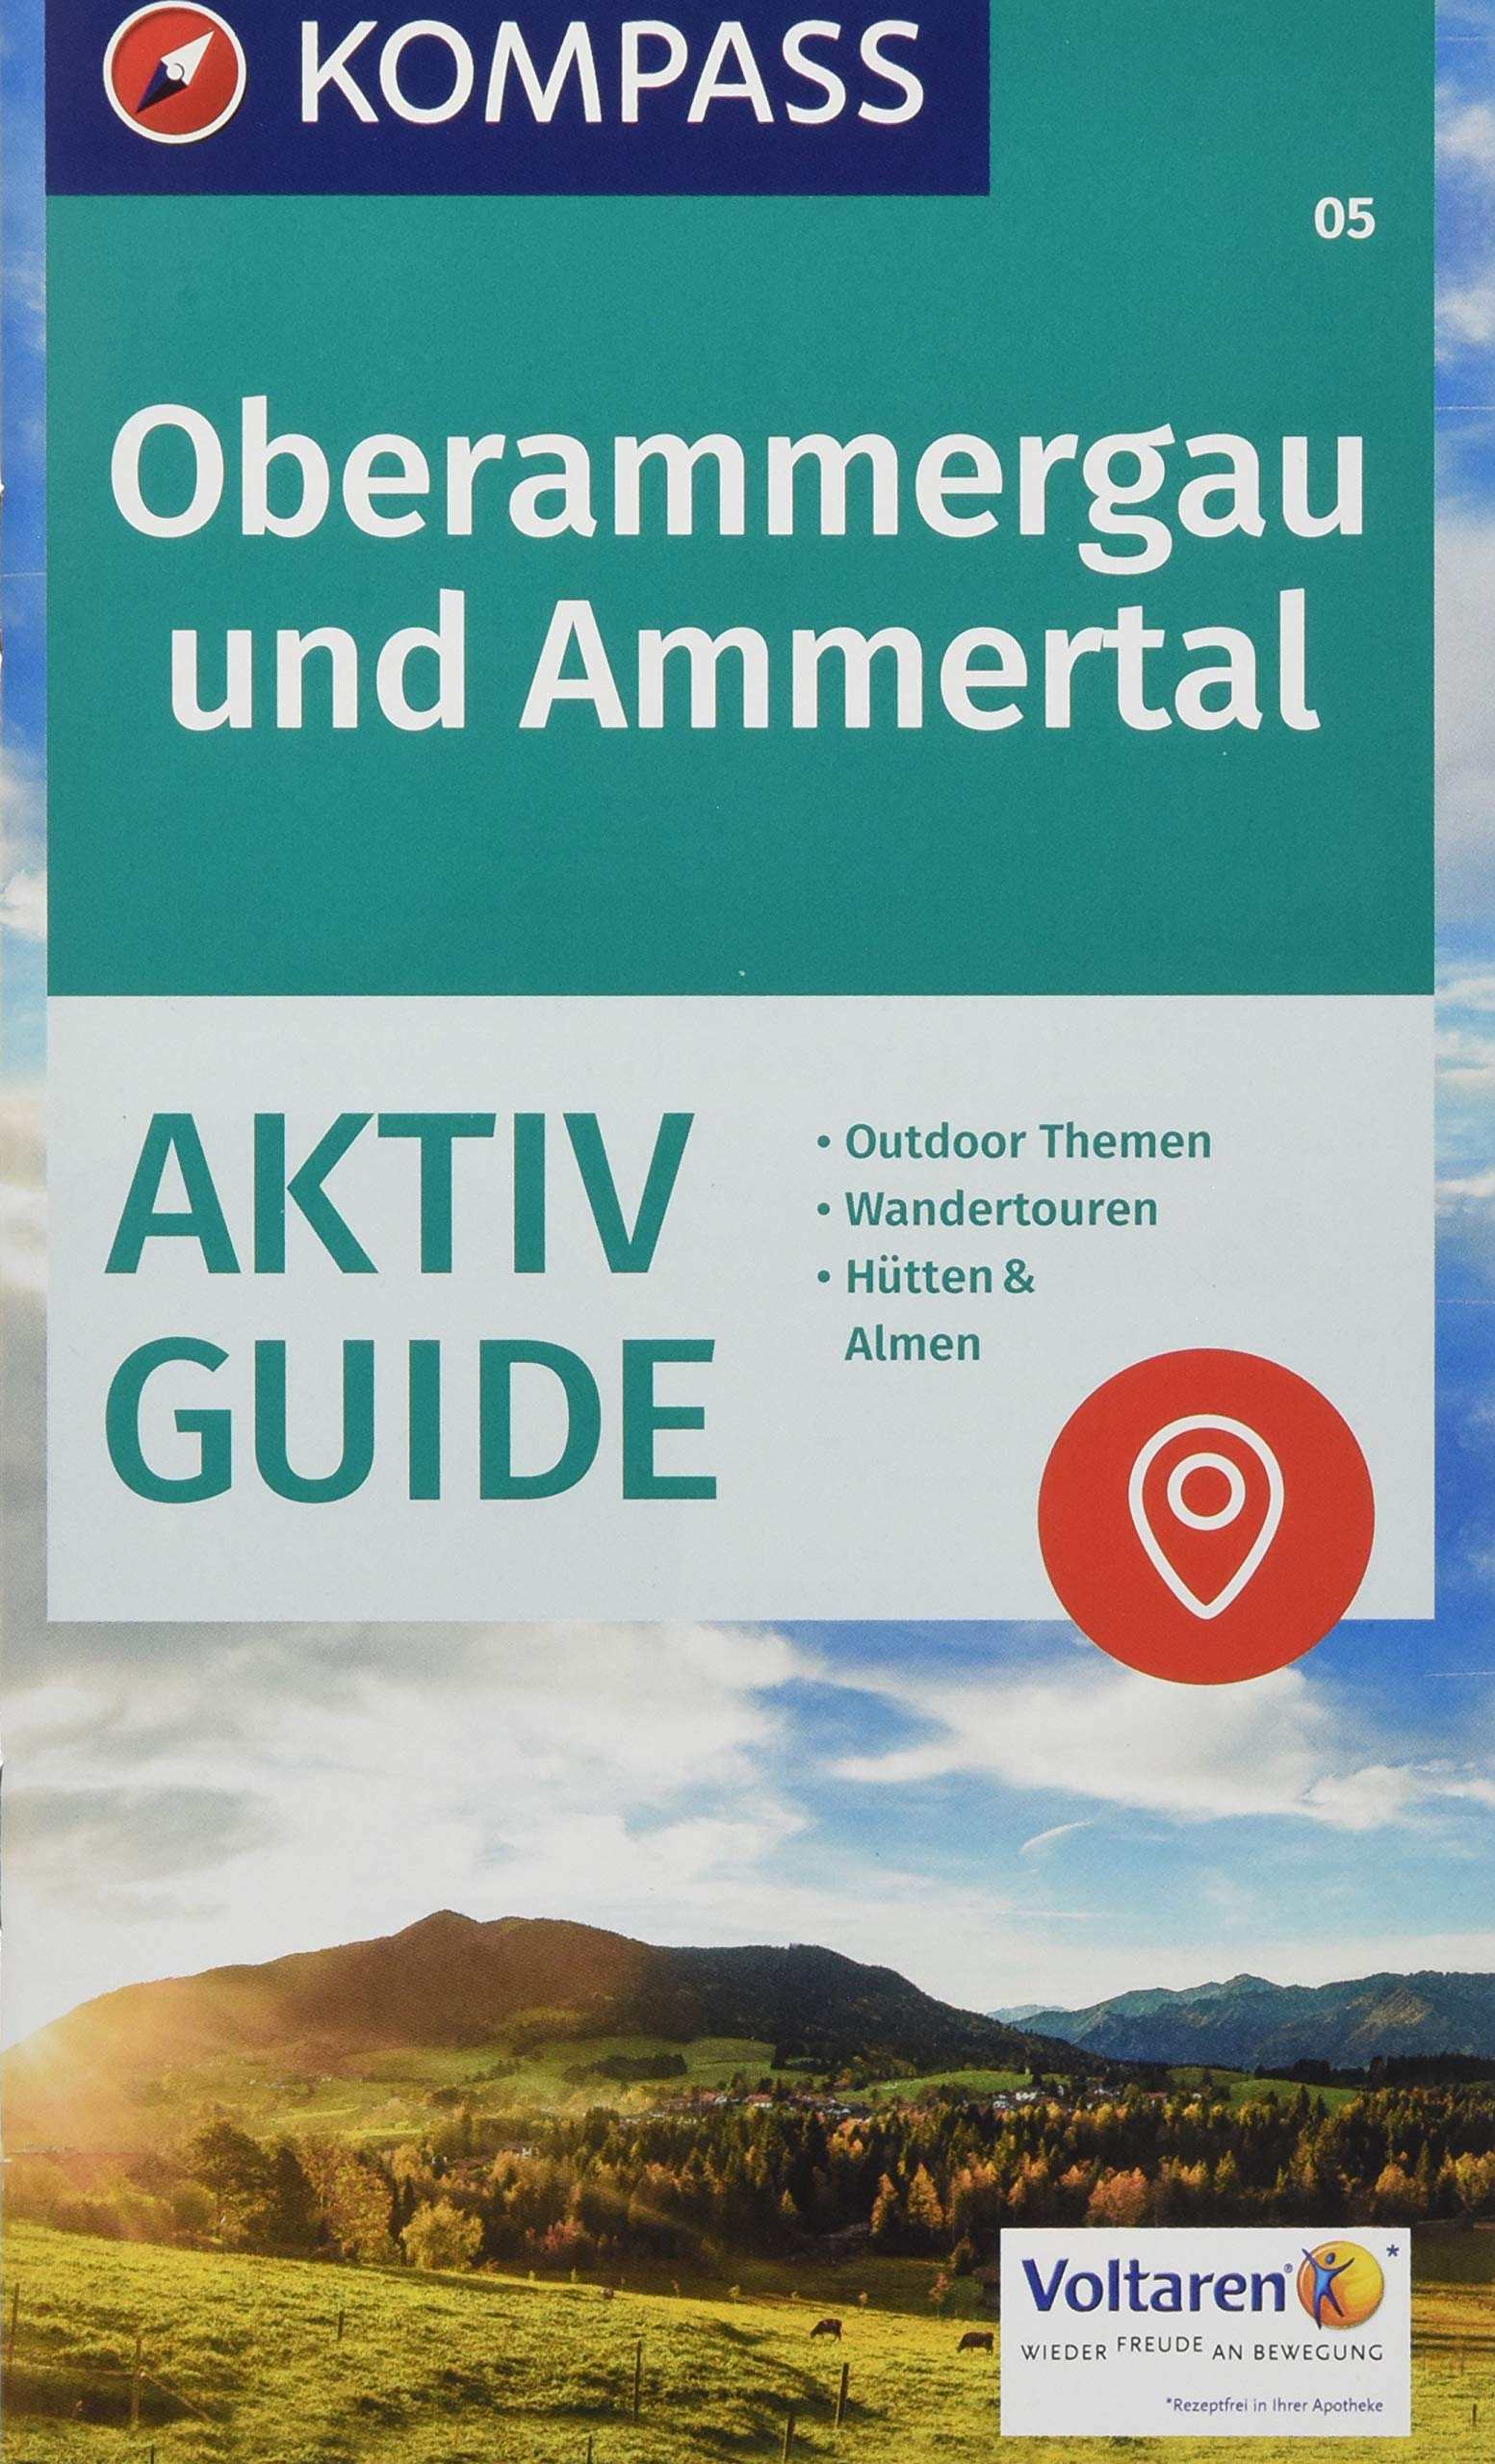 Kompass Wanderkarte Oberammergau Und Ammertal 3in1 Wanderkarte 1